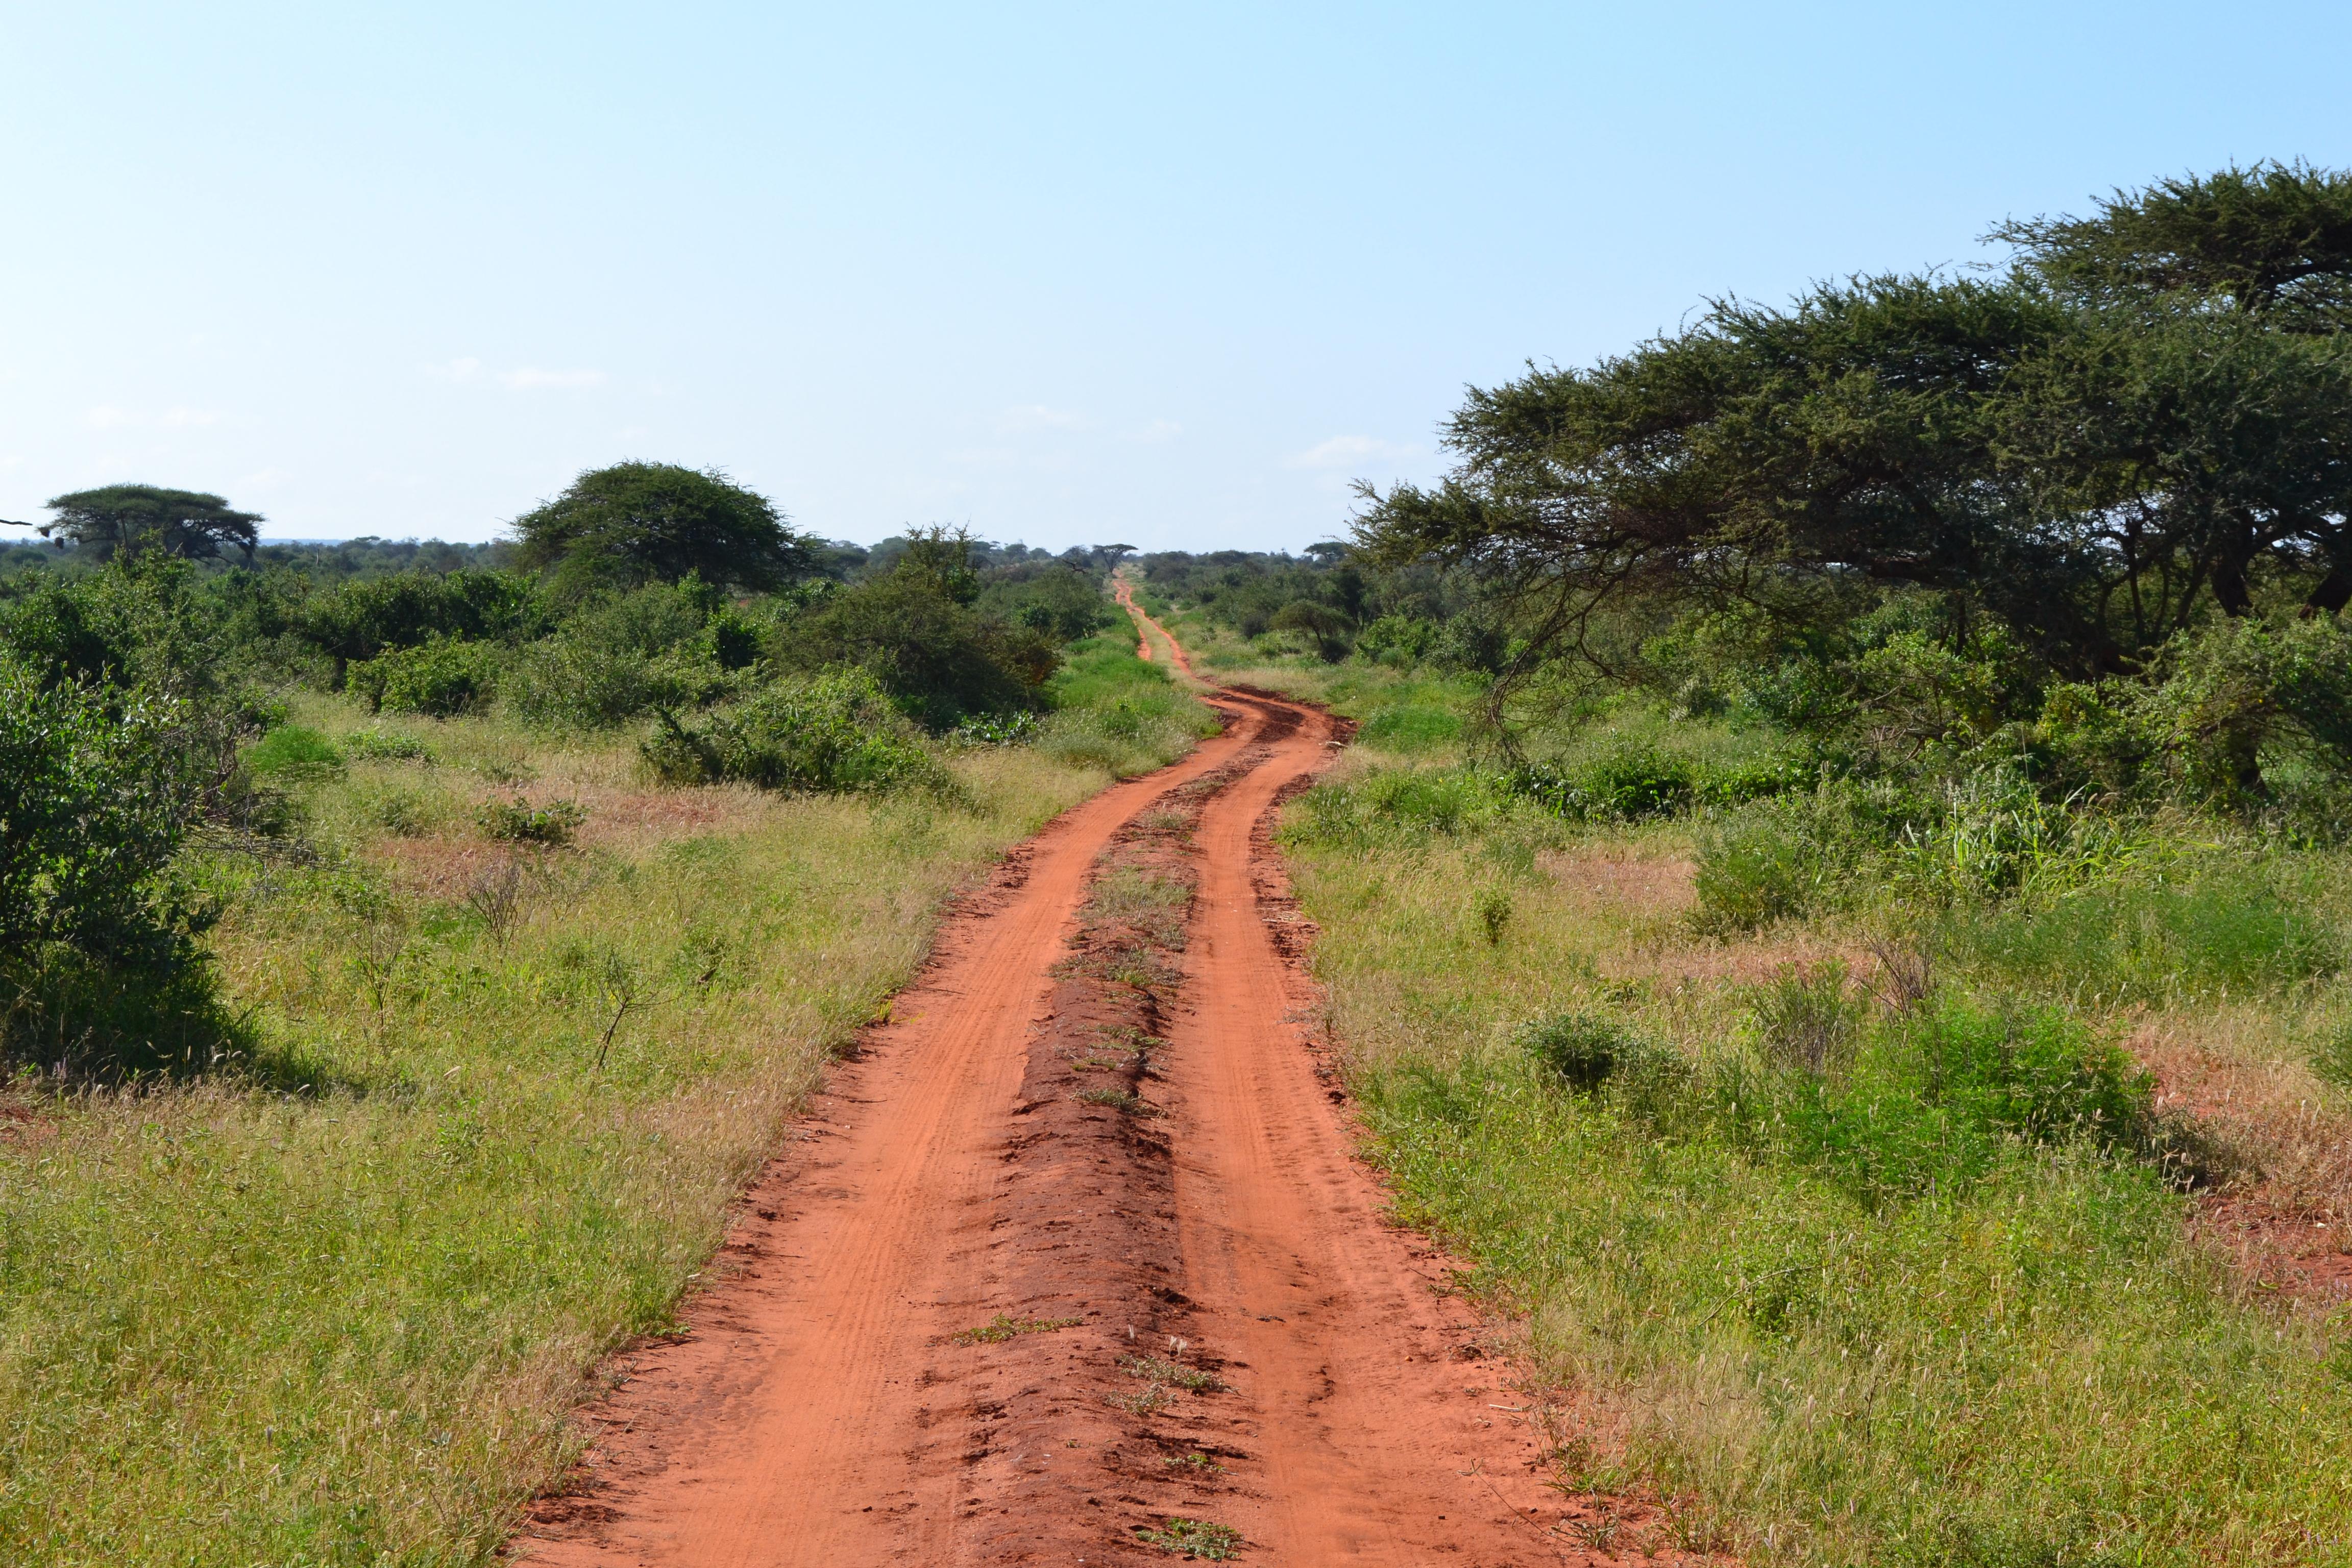 File:Dirt road facing south near the Voyager Ziwani Safari Camp, on ...